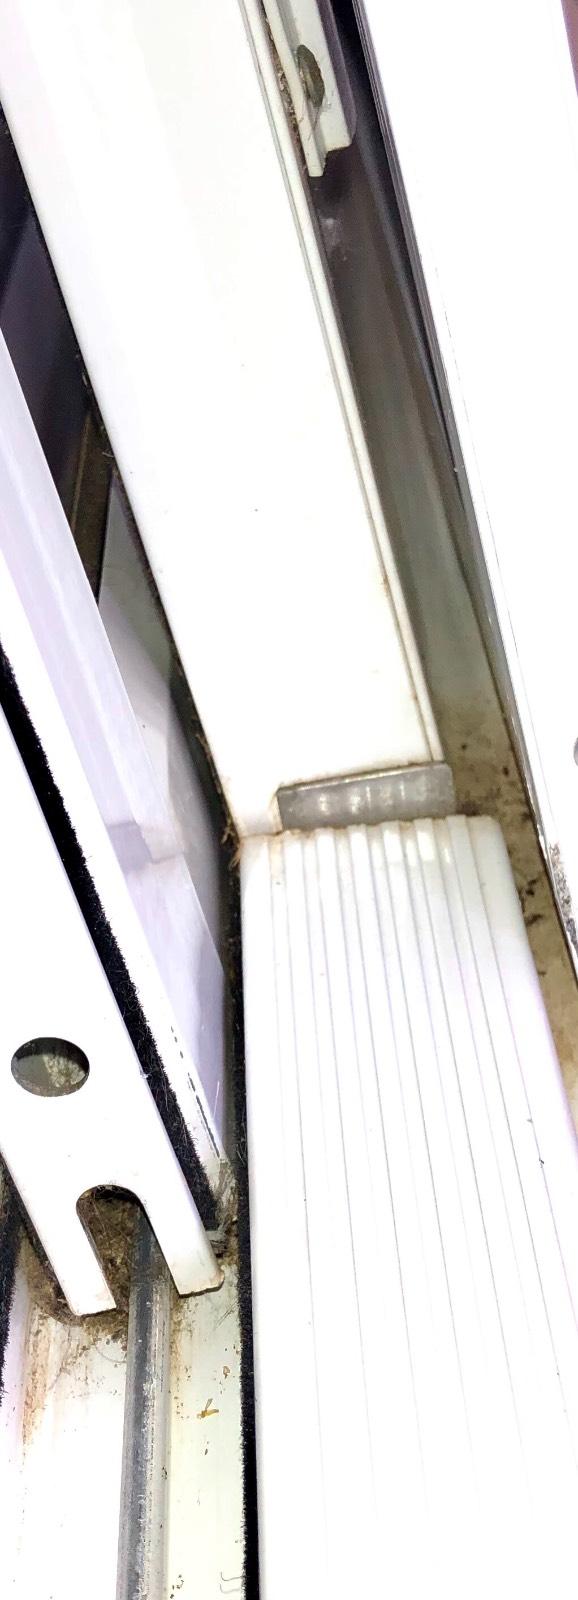 Help with identifying metal part on sliding door/ glass wind